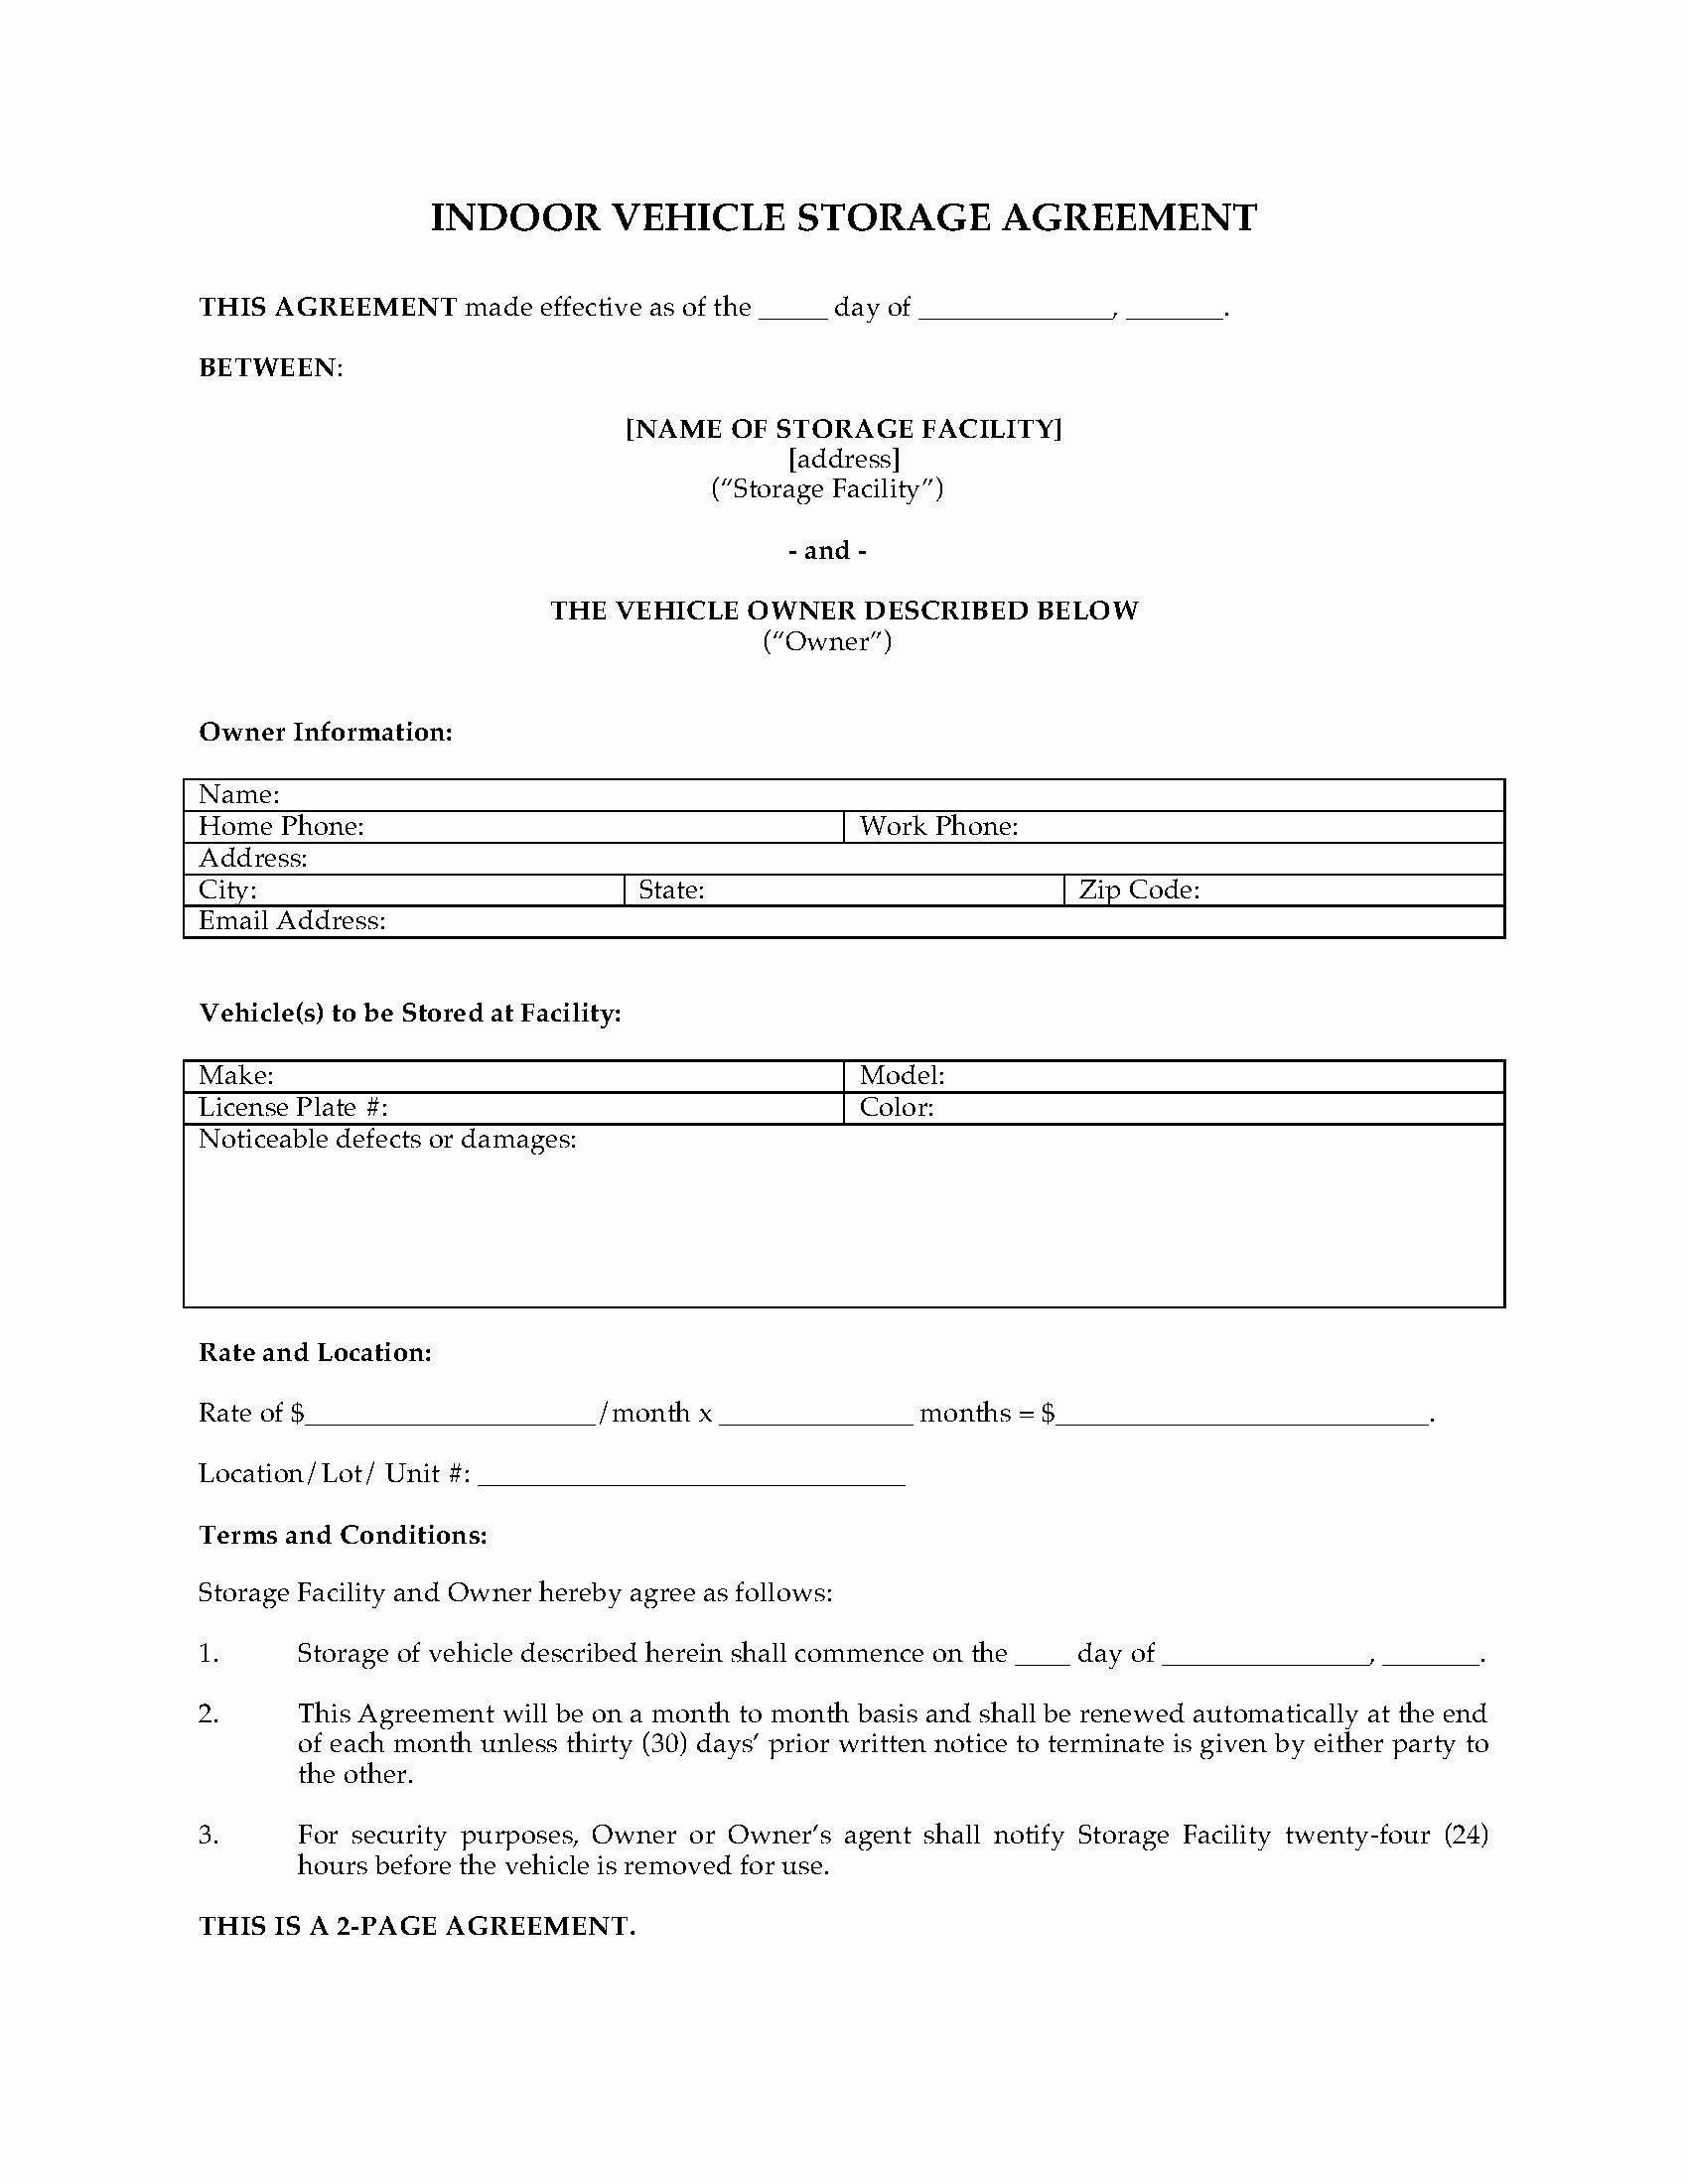 Vehicle Storage Contract Template Inspirational Missouri Vehicle Storage Agreement